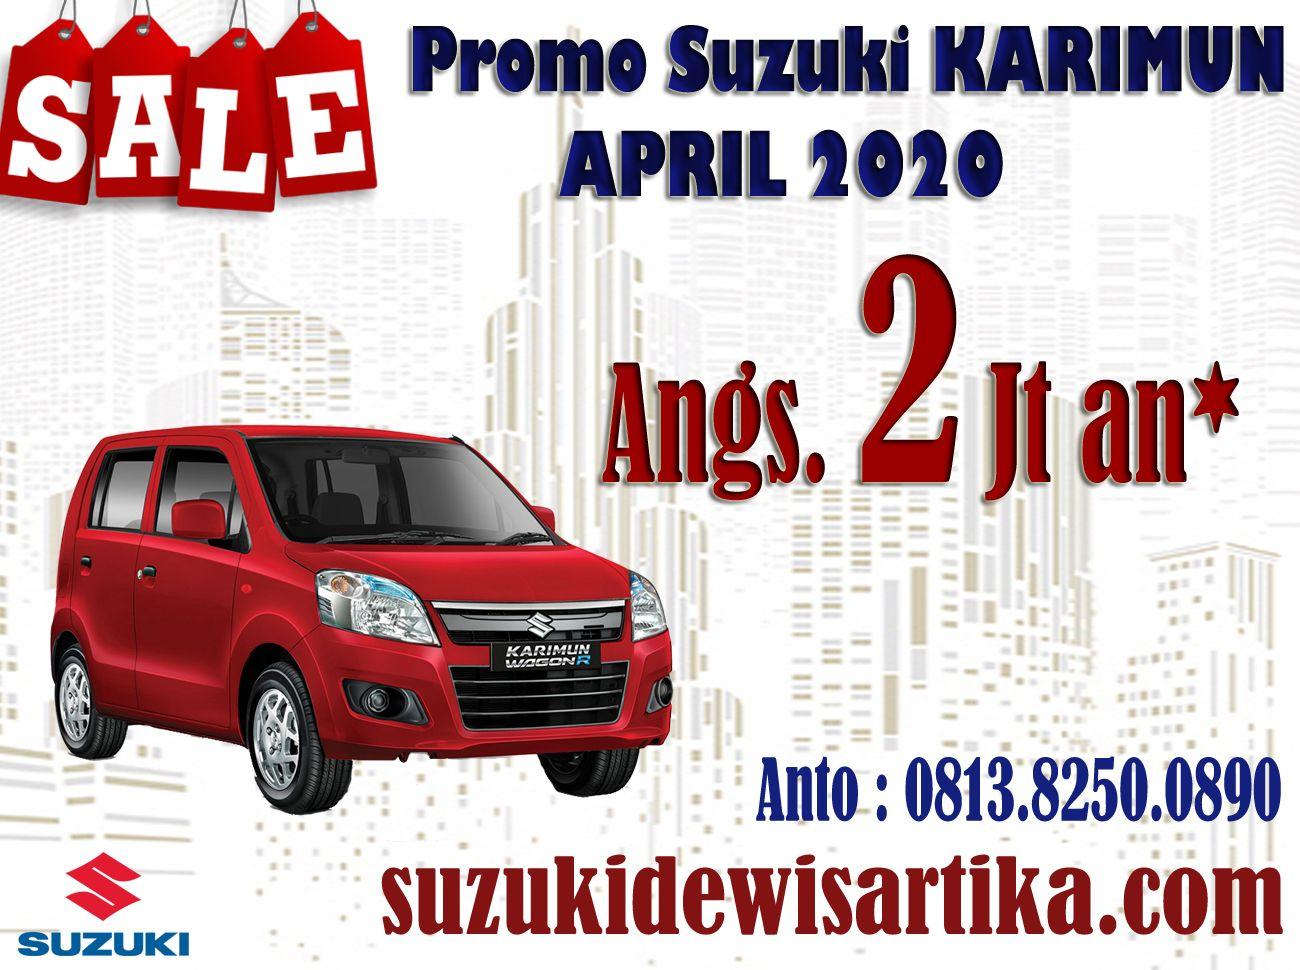 Promo Suzuki Karimun Wagon R Bulan April 2020